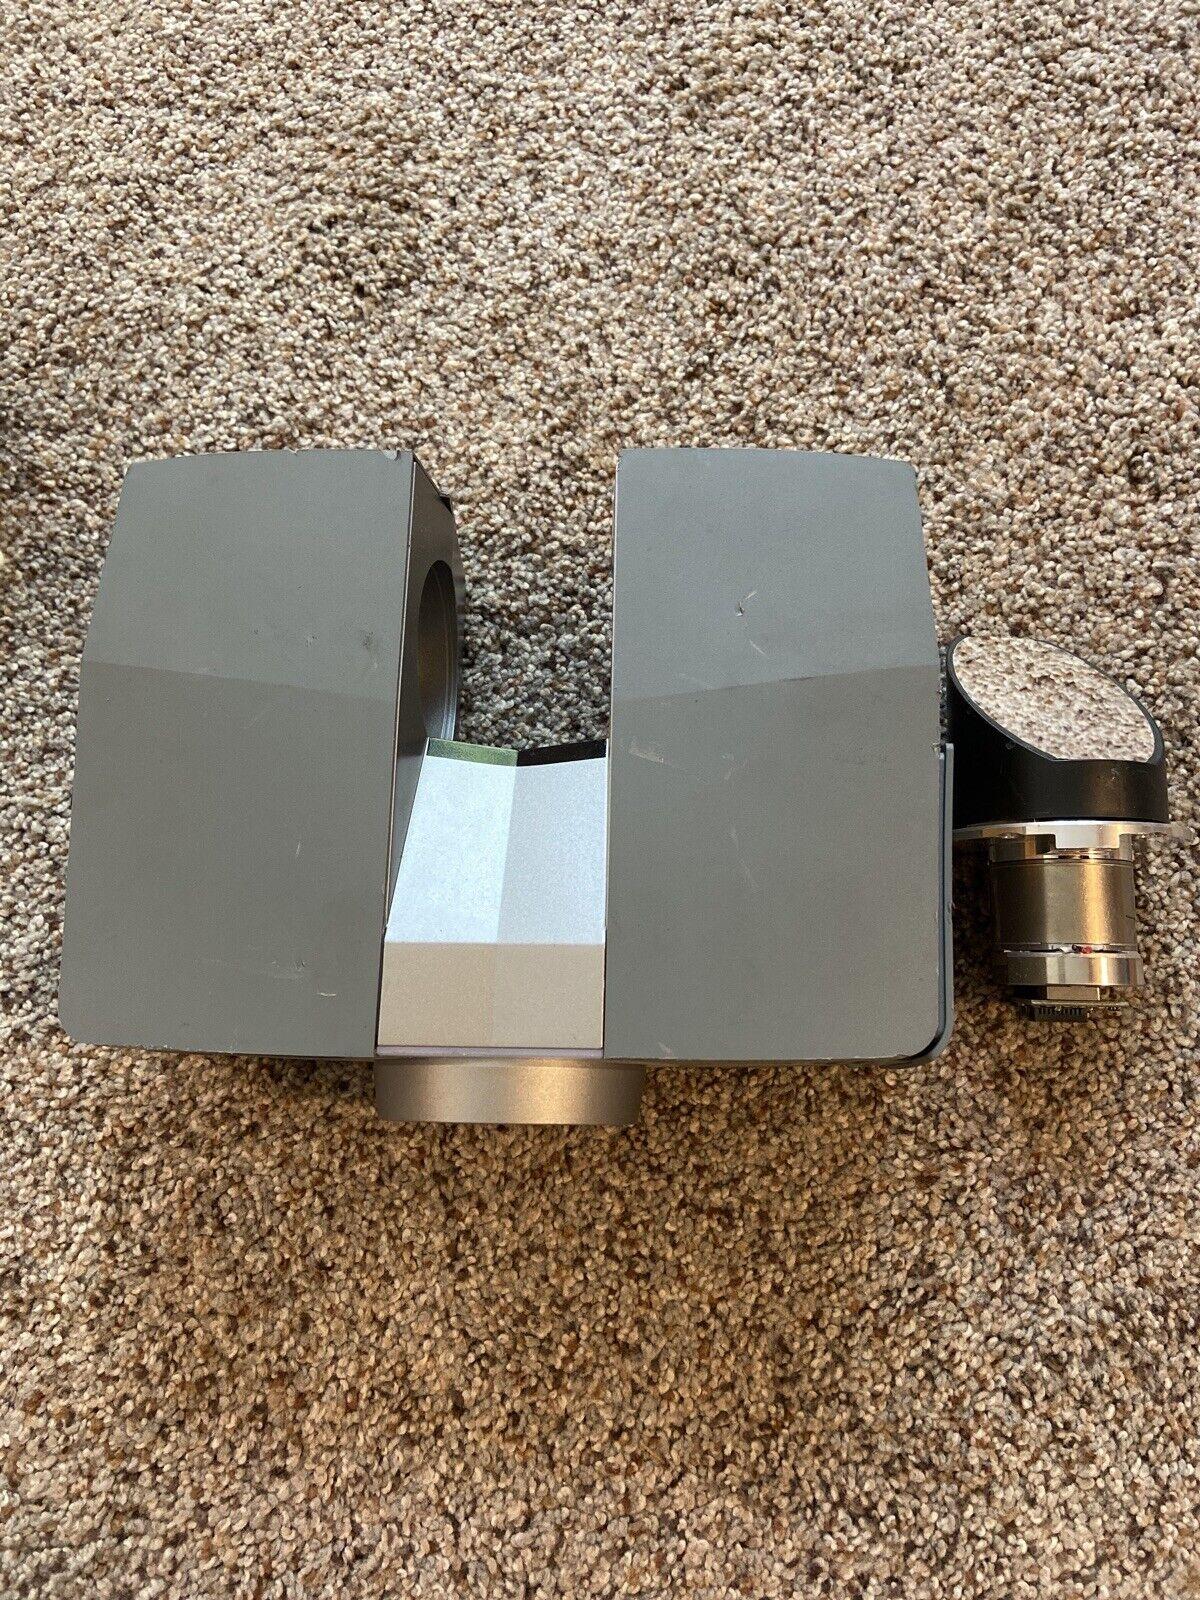 2013 Model Trimble TX5 3D Laser Scanner For PARTS OR REPAIR!